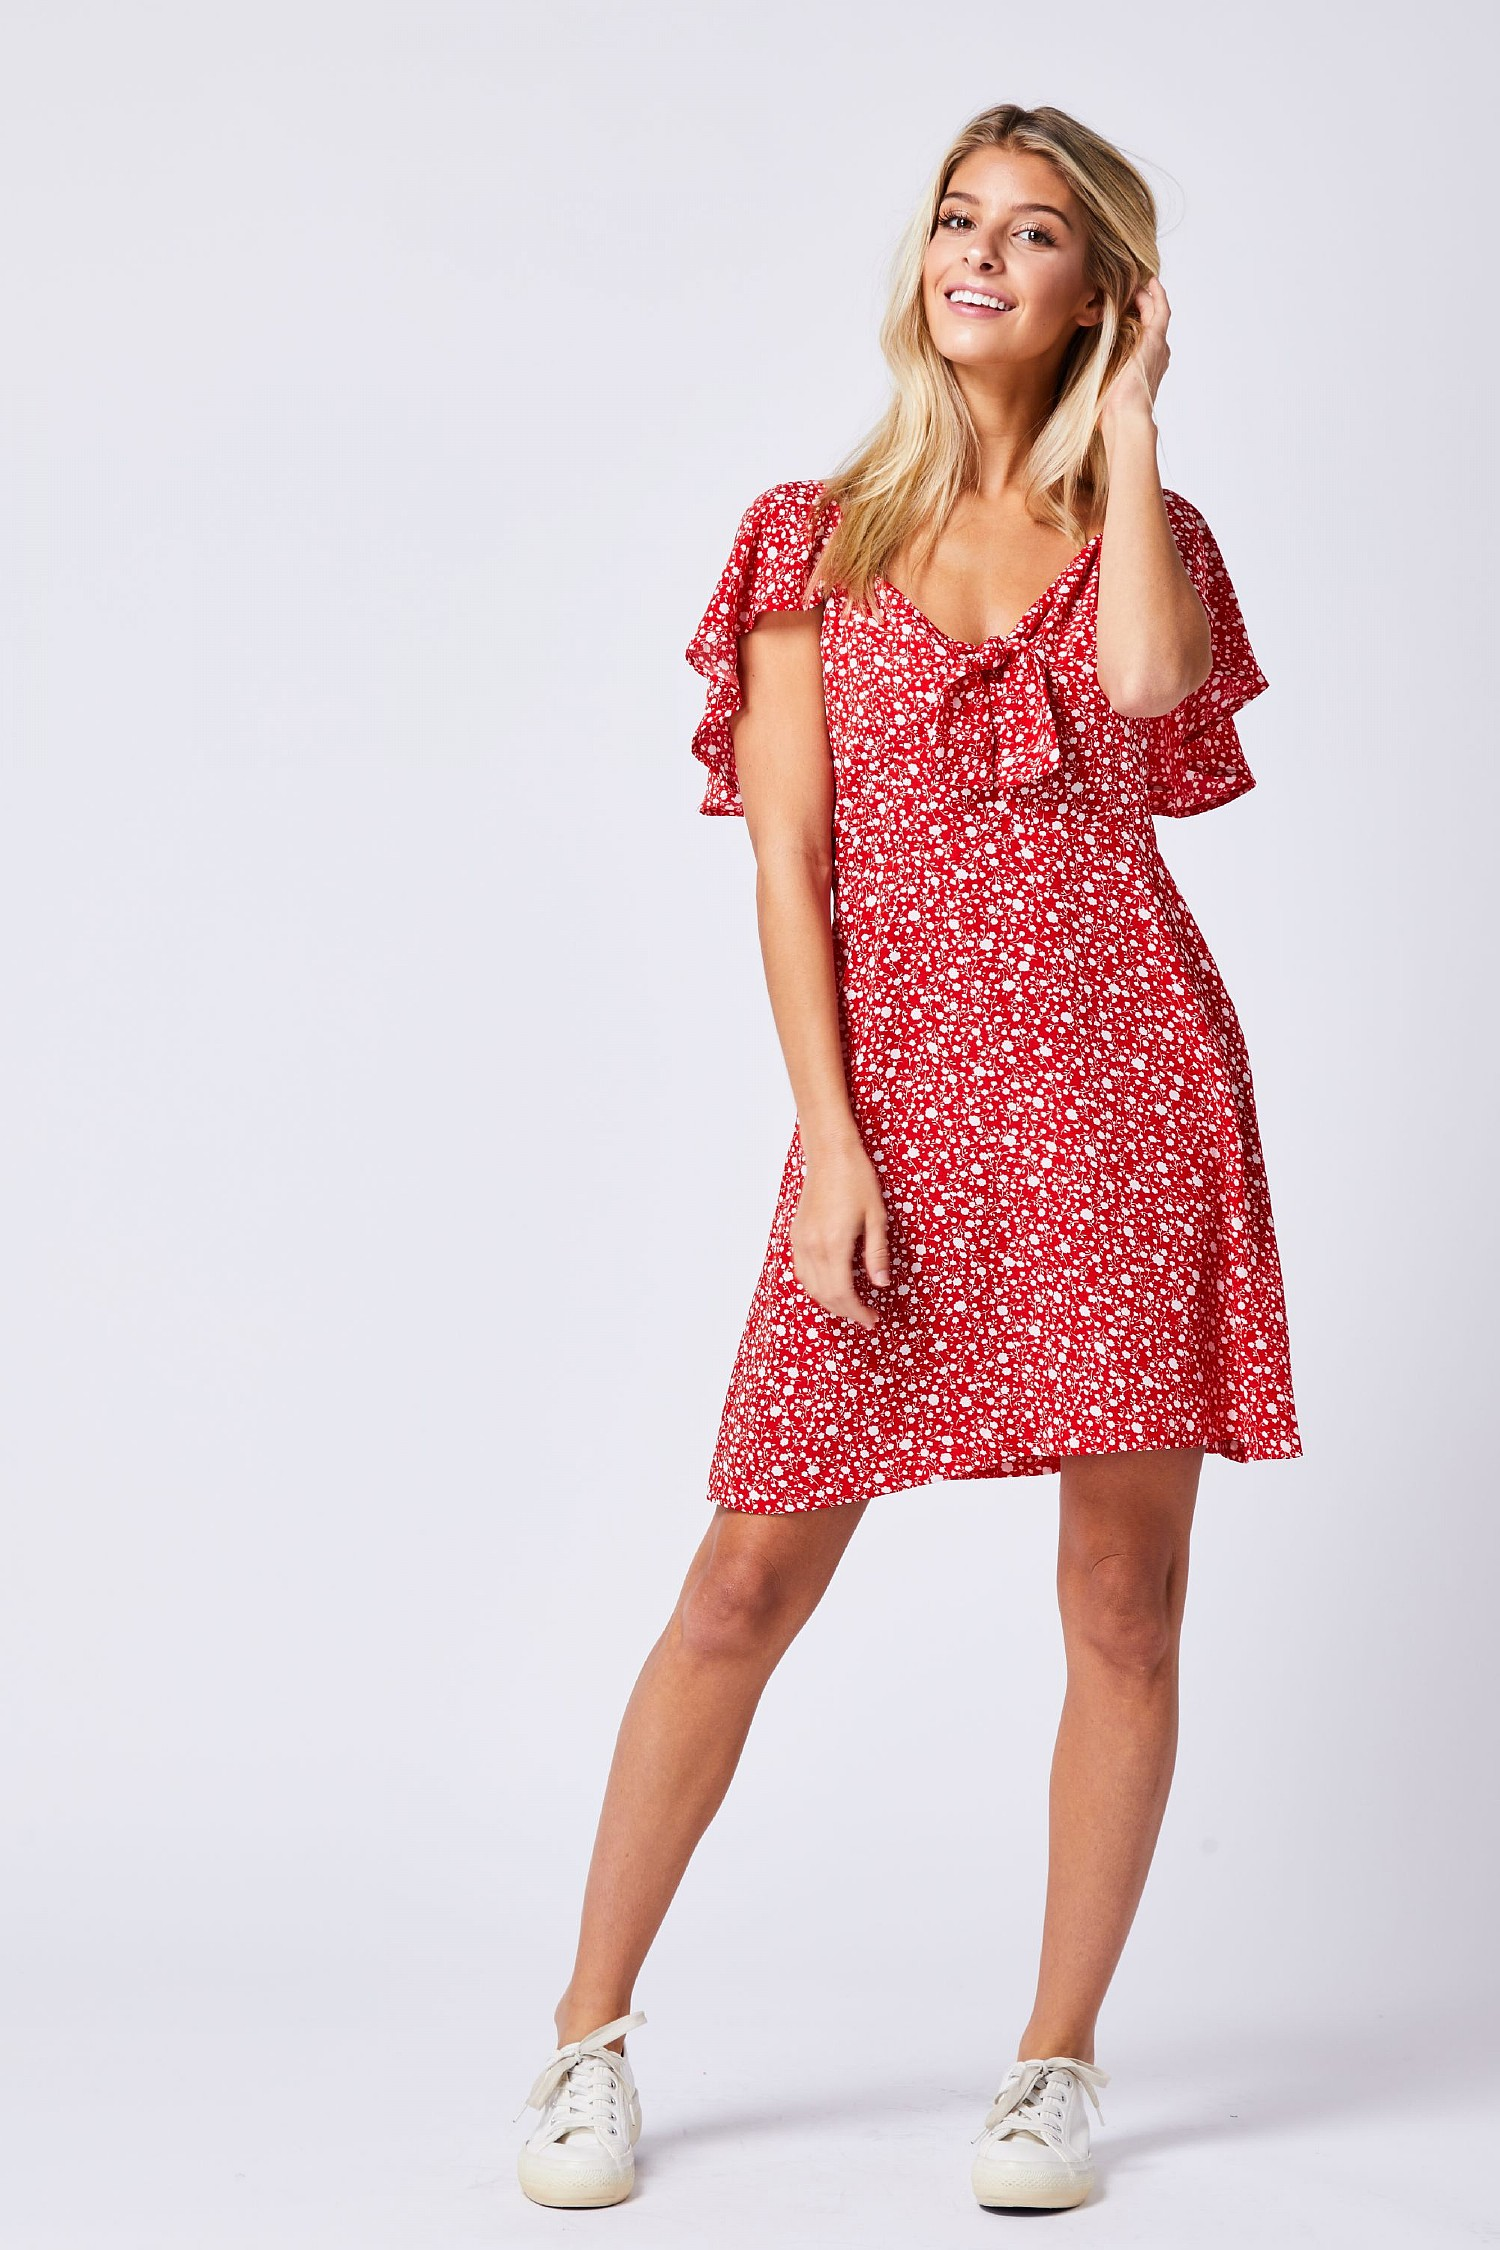 Red Polka Dot Mini Dress